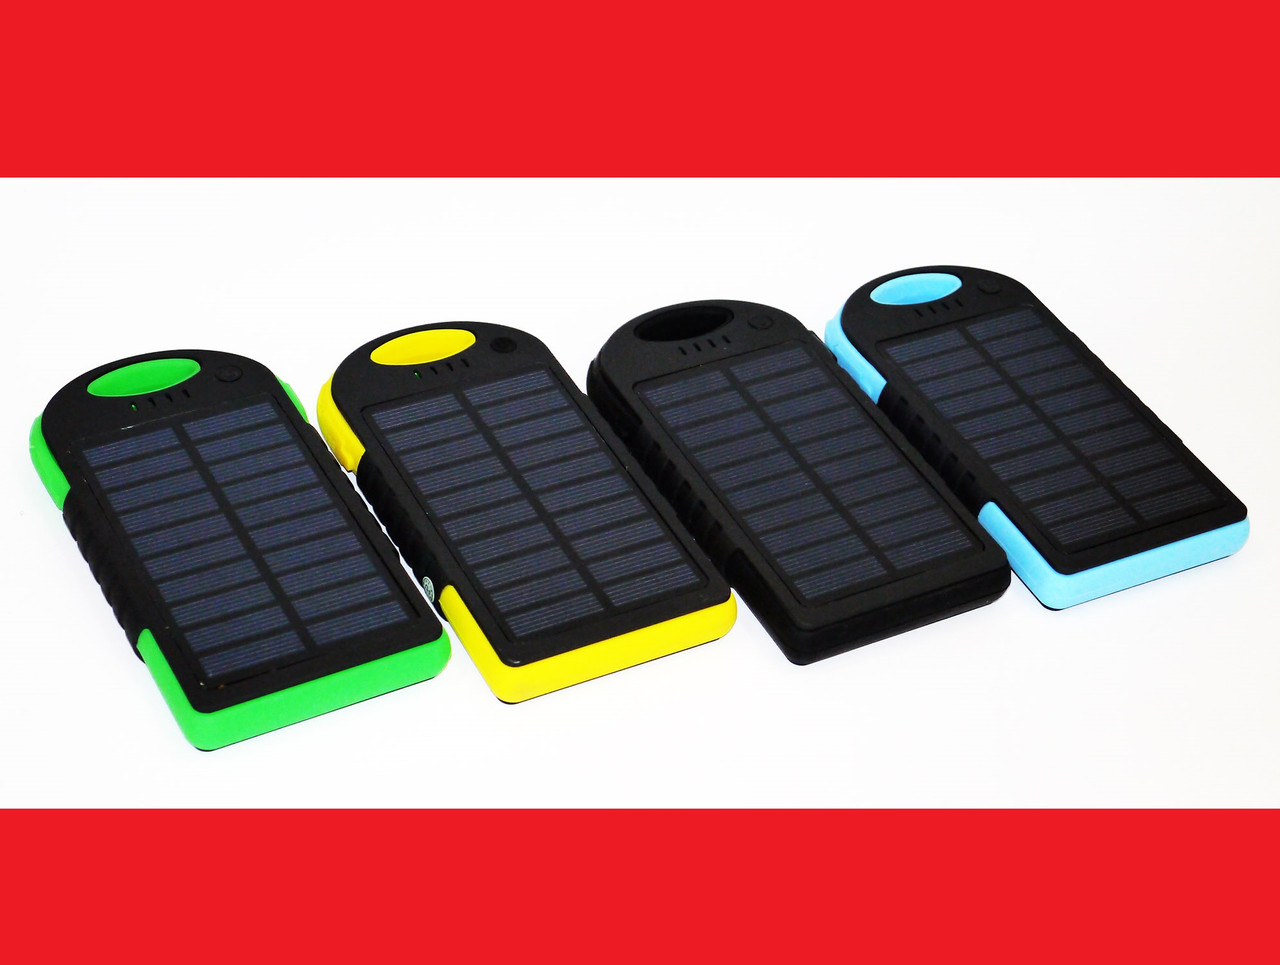 Солнечное зарядное устройство Power Bank 45000 mAh + LED фонарик